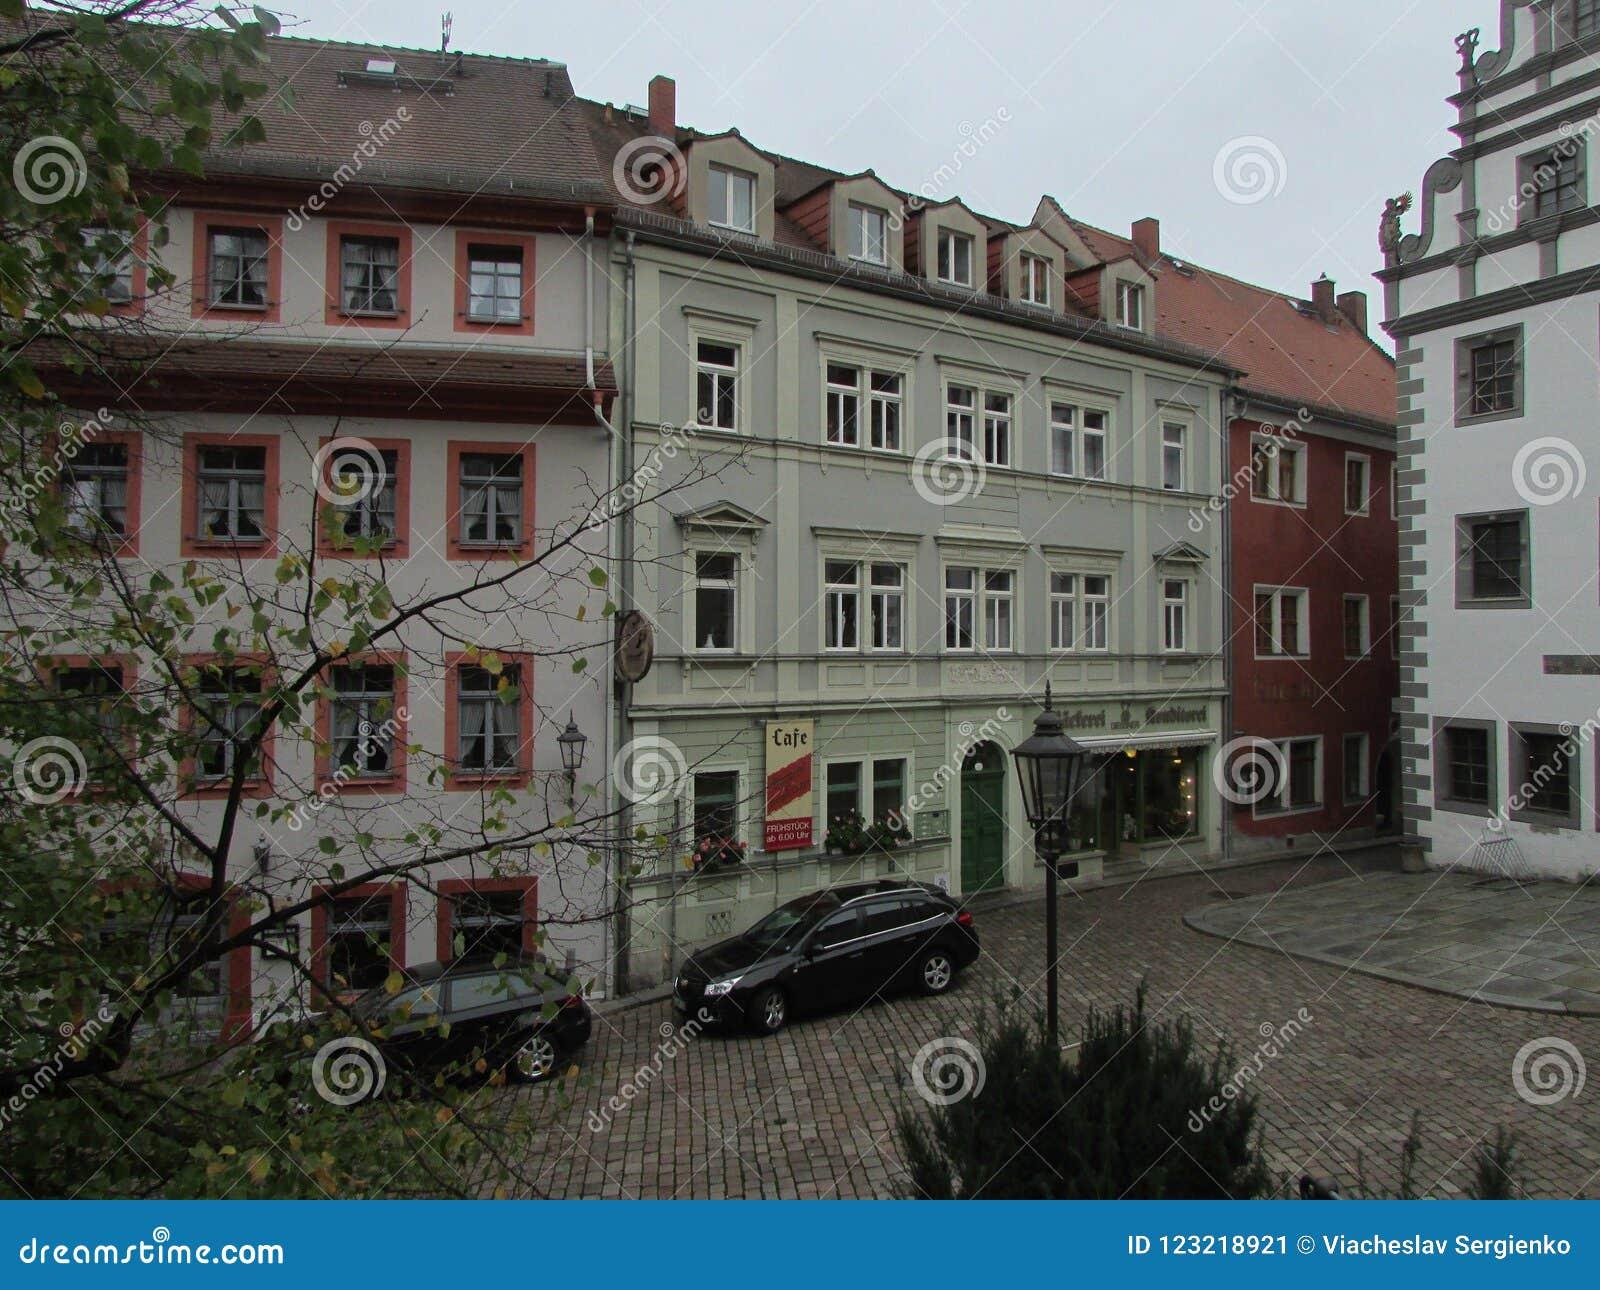 Typical German courtyard. Mason, Germany.